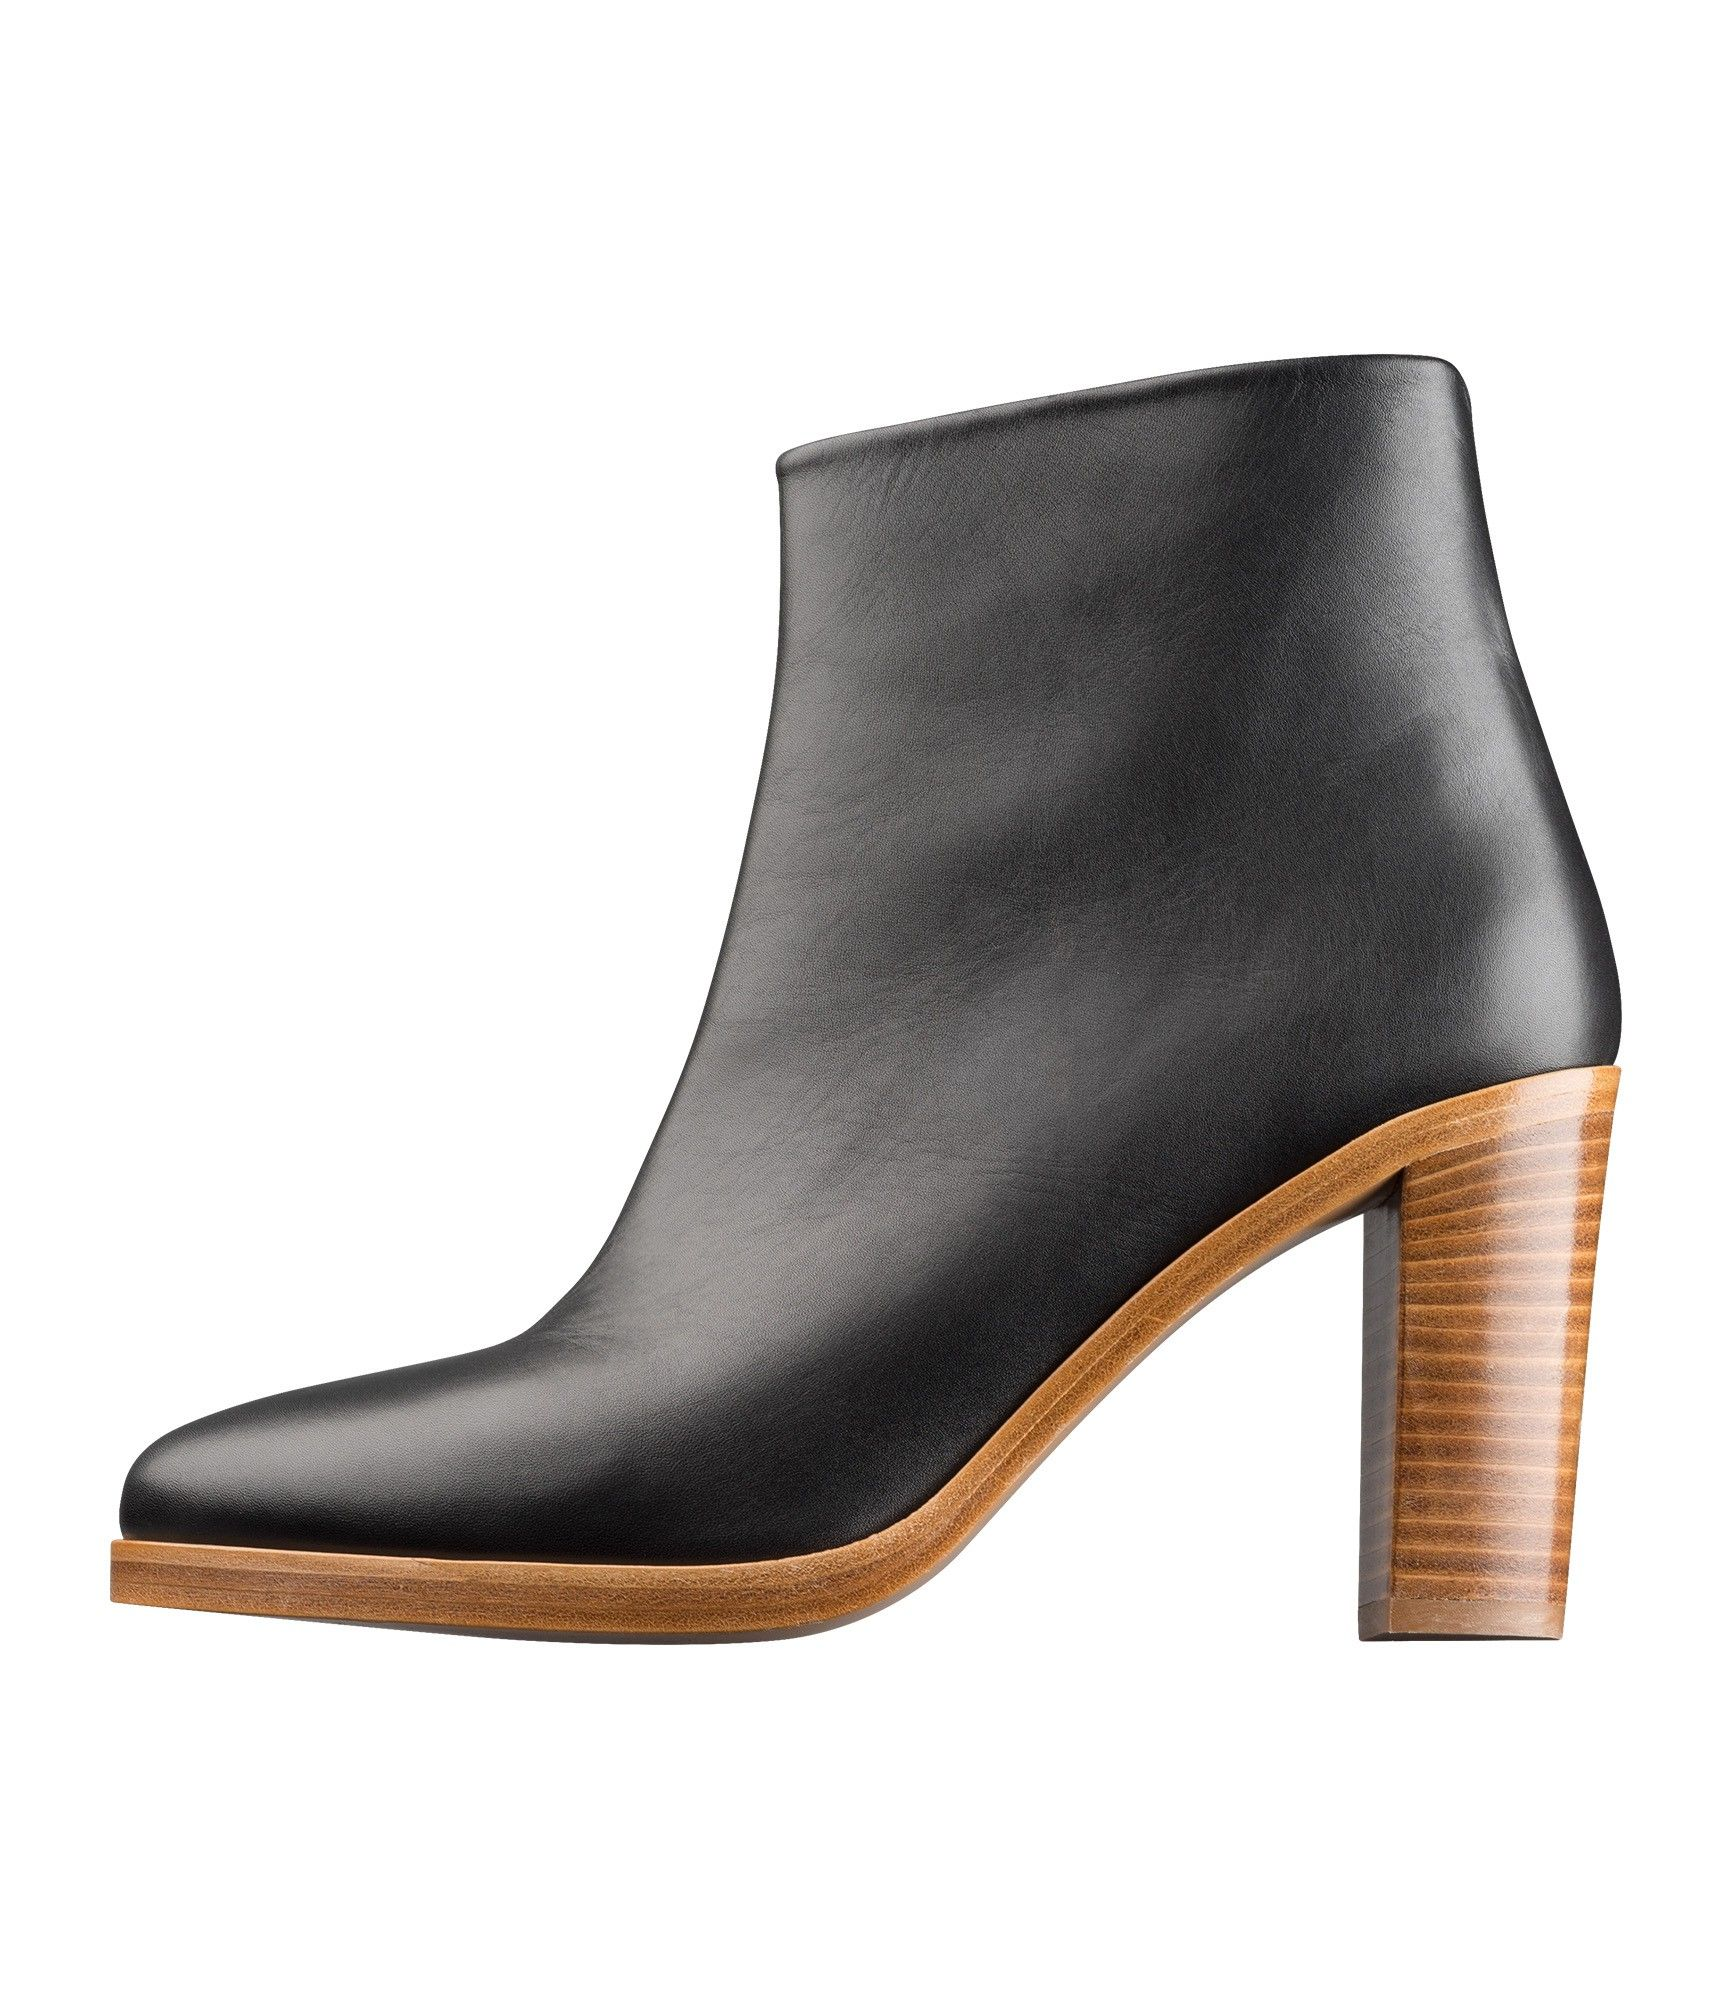 Women en APC boots ankle 2019ChaussureChaussures Chic SVpzMU